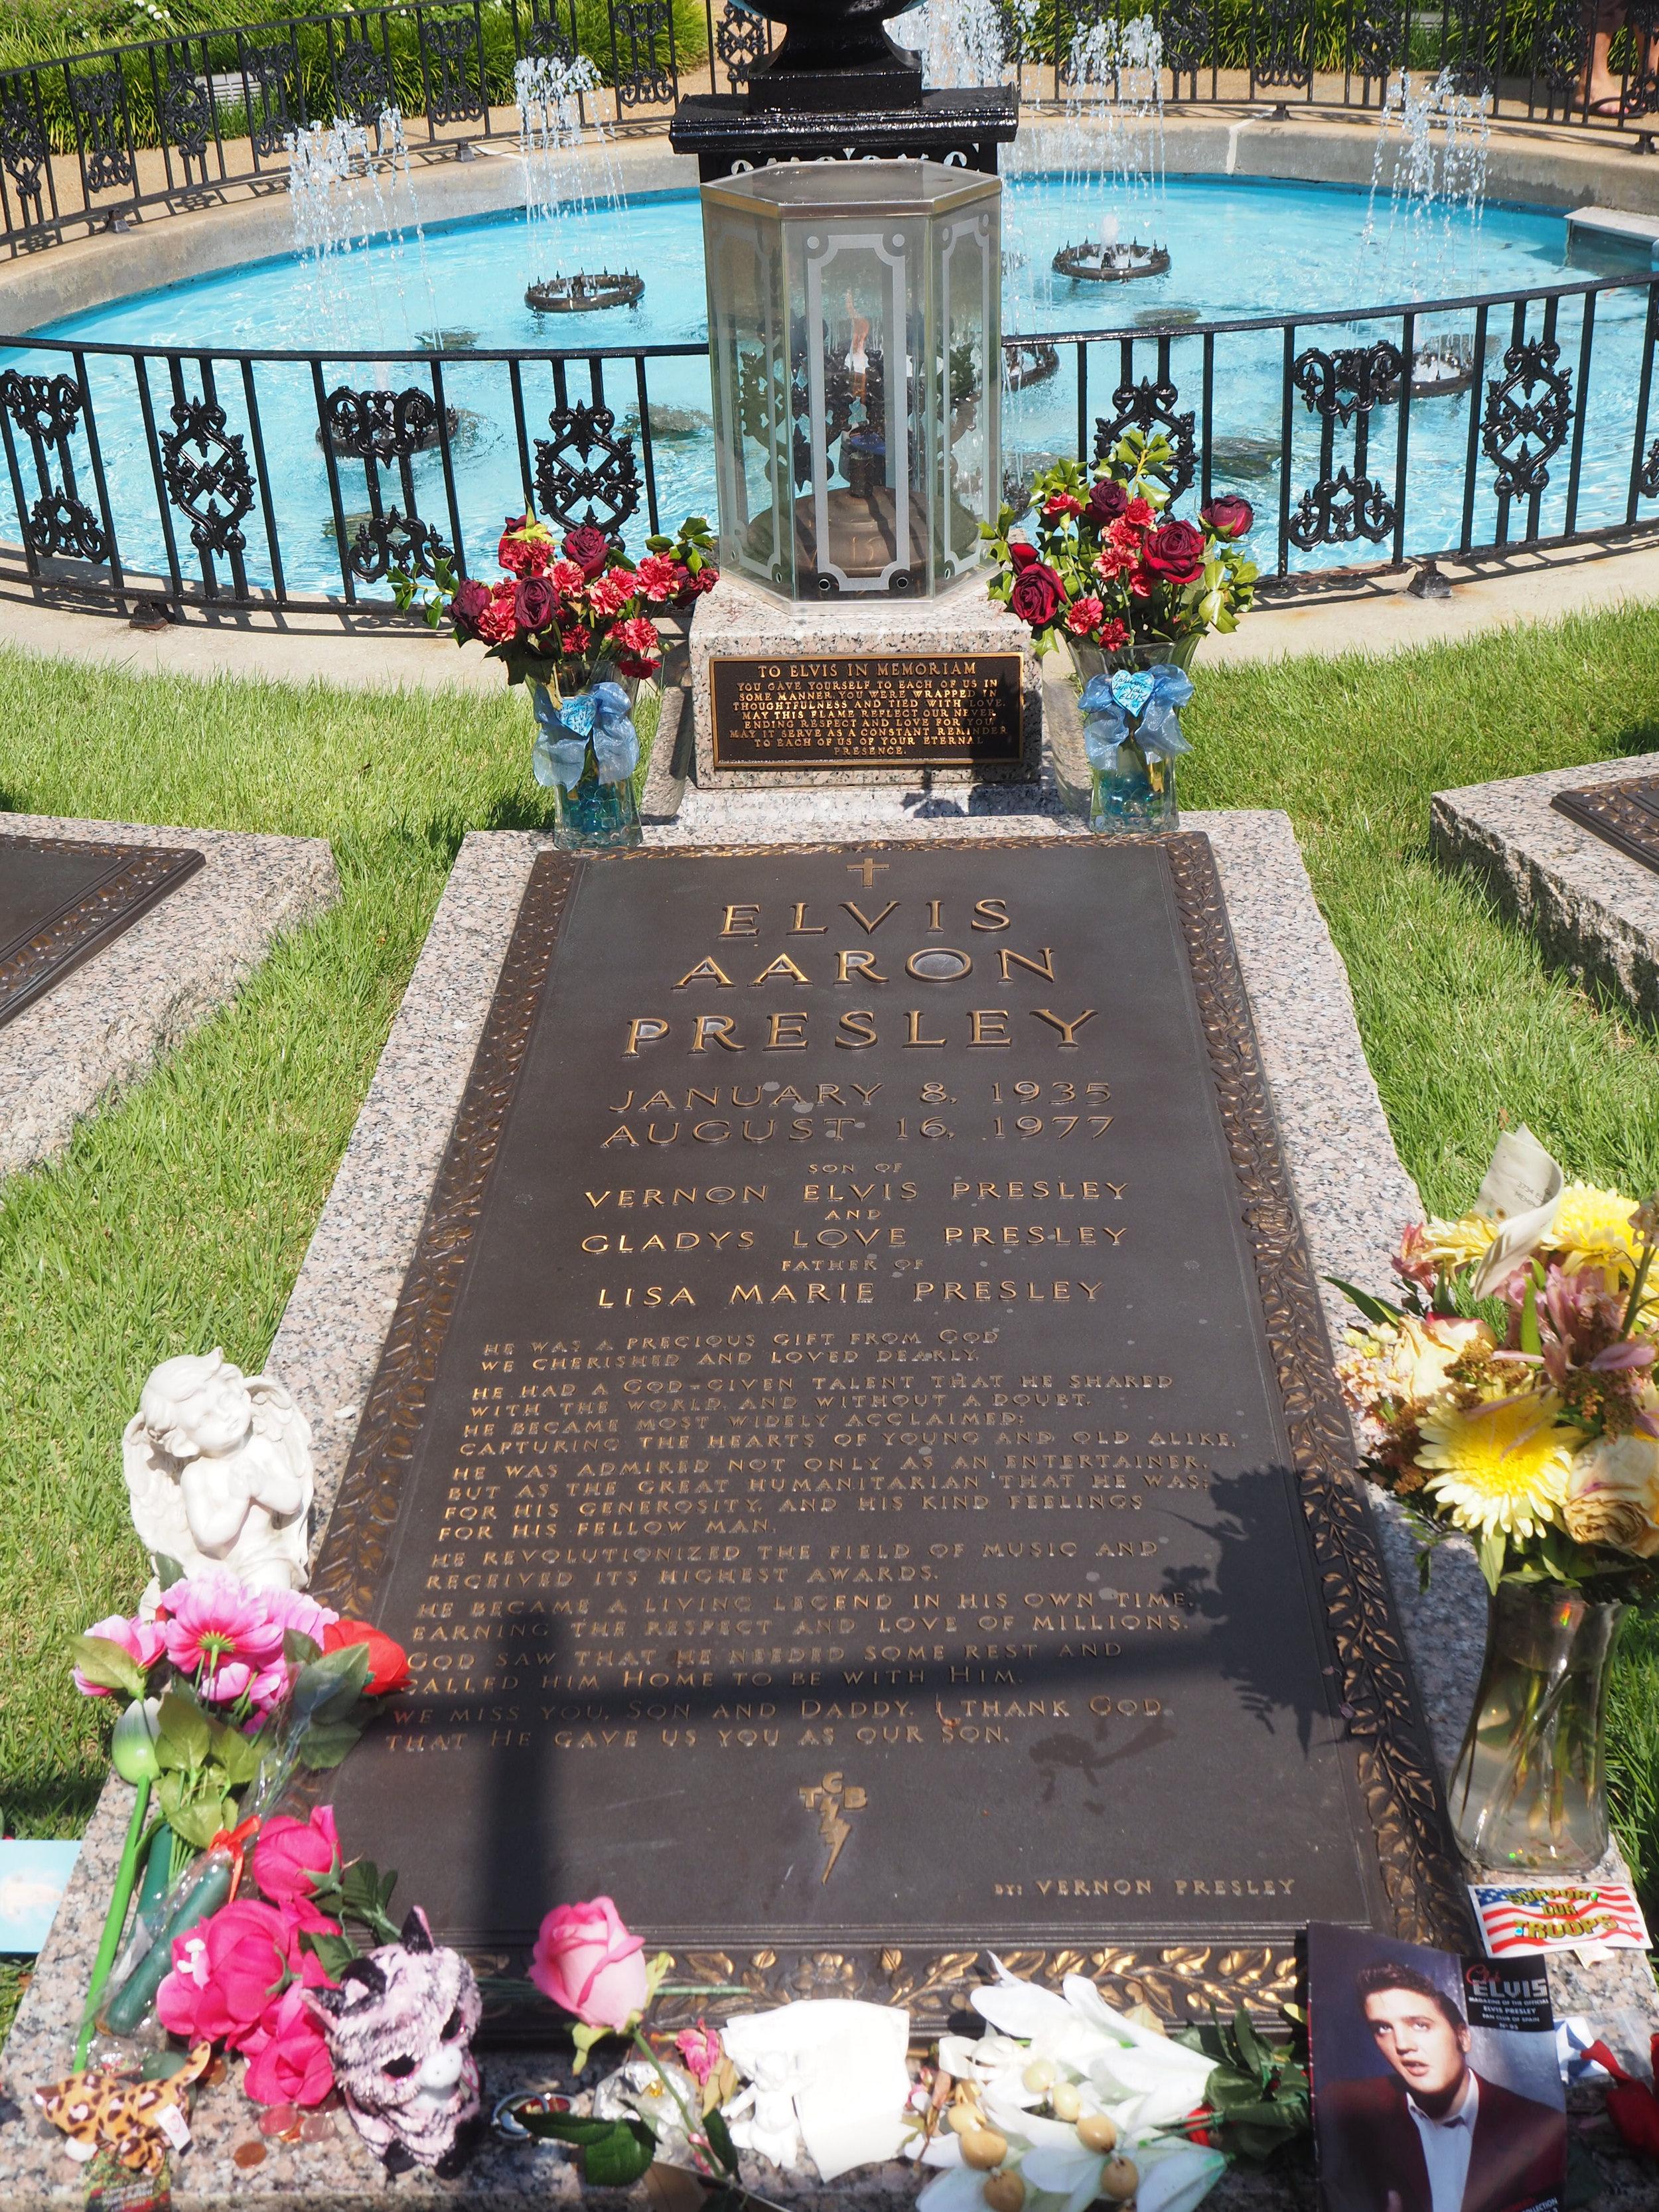 Elvis Presley | Graceland | Memphis, Tennessee.  Elvis Aaron Presley's grave. Click to see more pics.